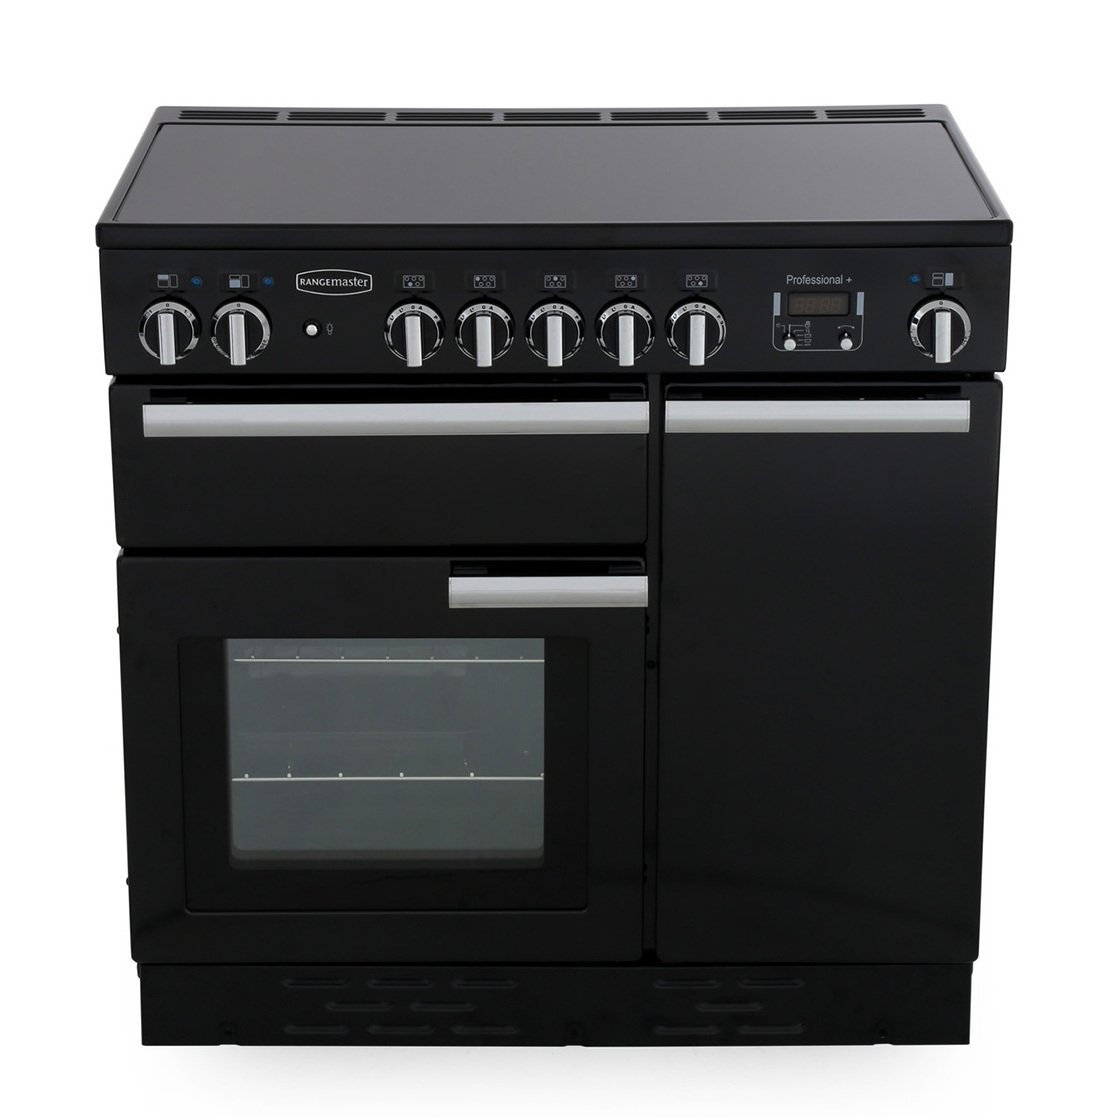 Rangemaster PROP90EIGB/C Professional Plus Gloss Black with Chrome Trim 90cm Electric Induction Range Cooker